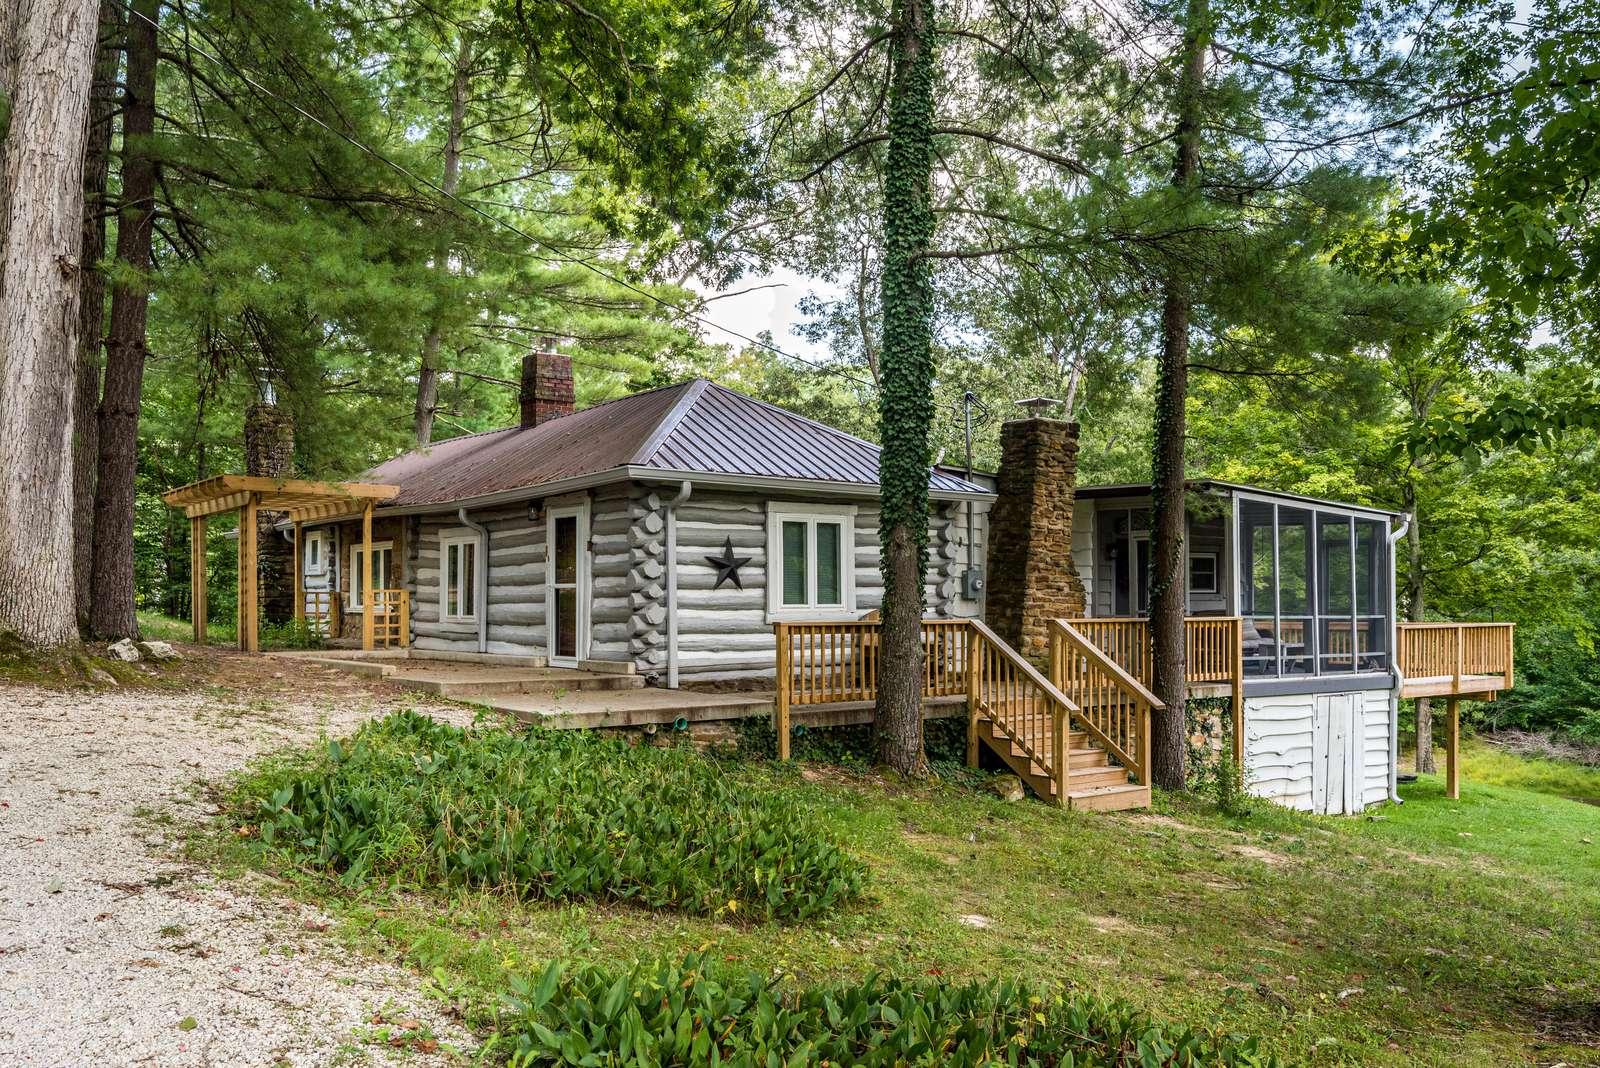 Serenity Vacation Log Cabin - property